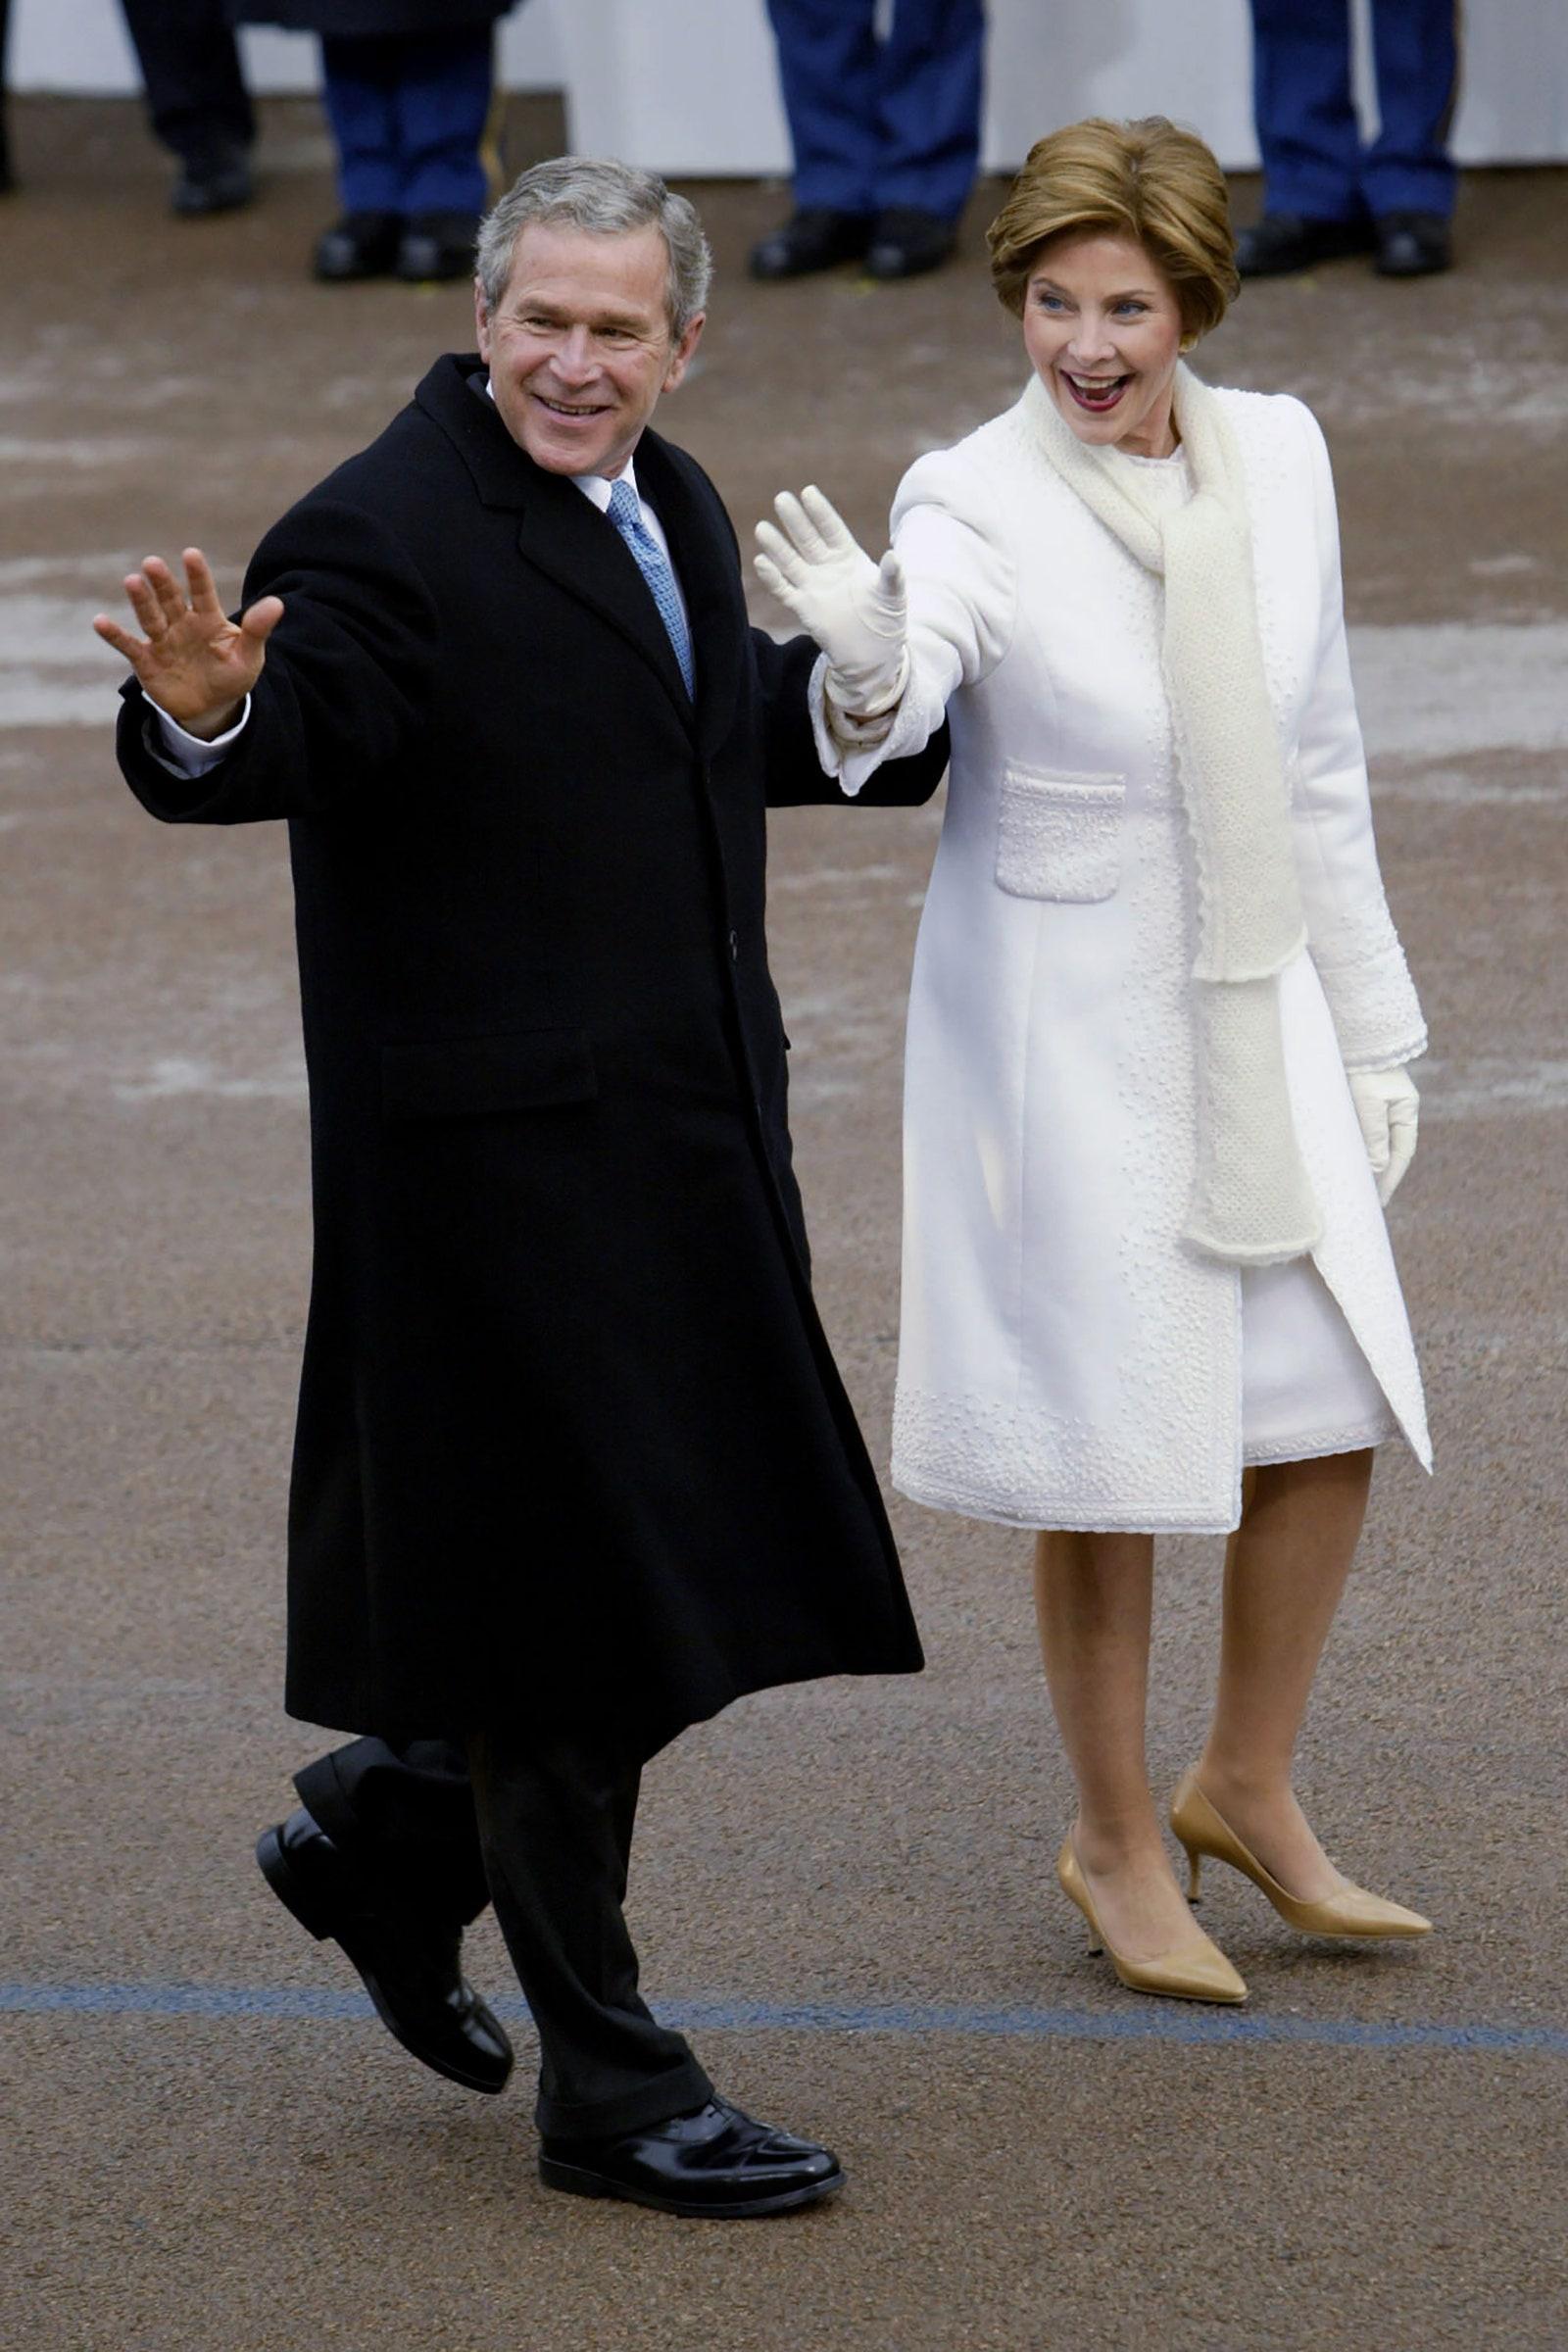 Laura Bush Inauguration 2005